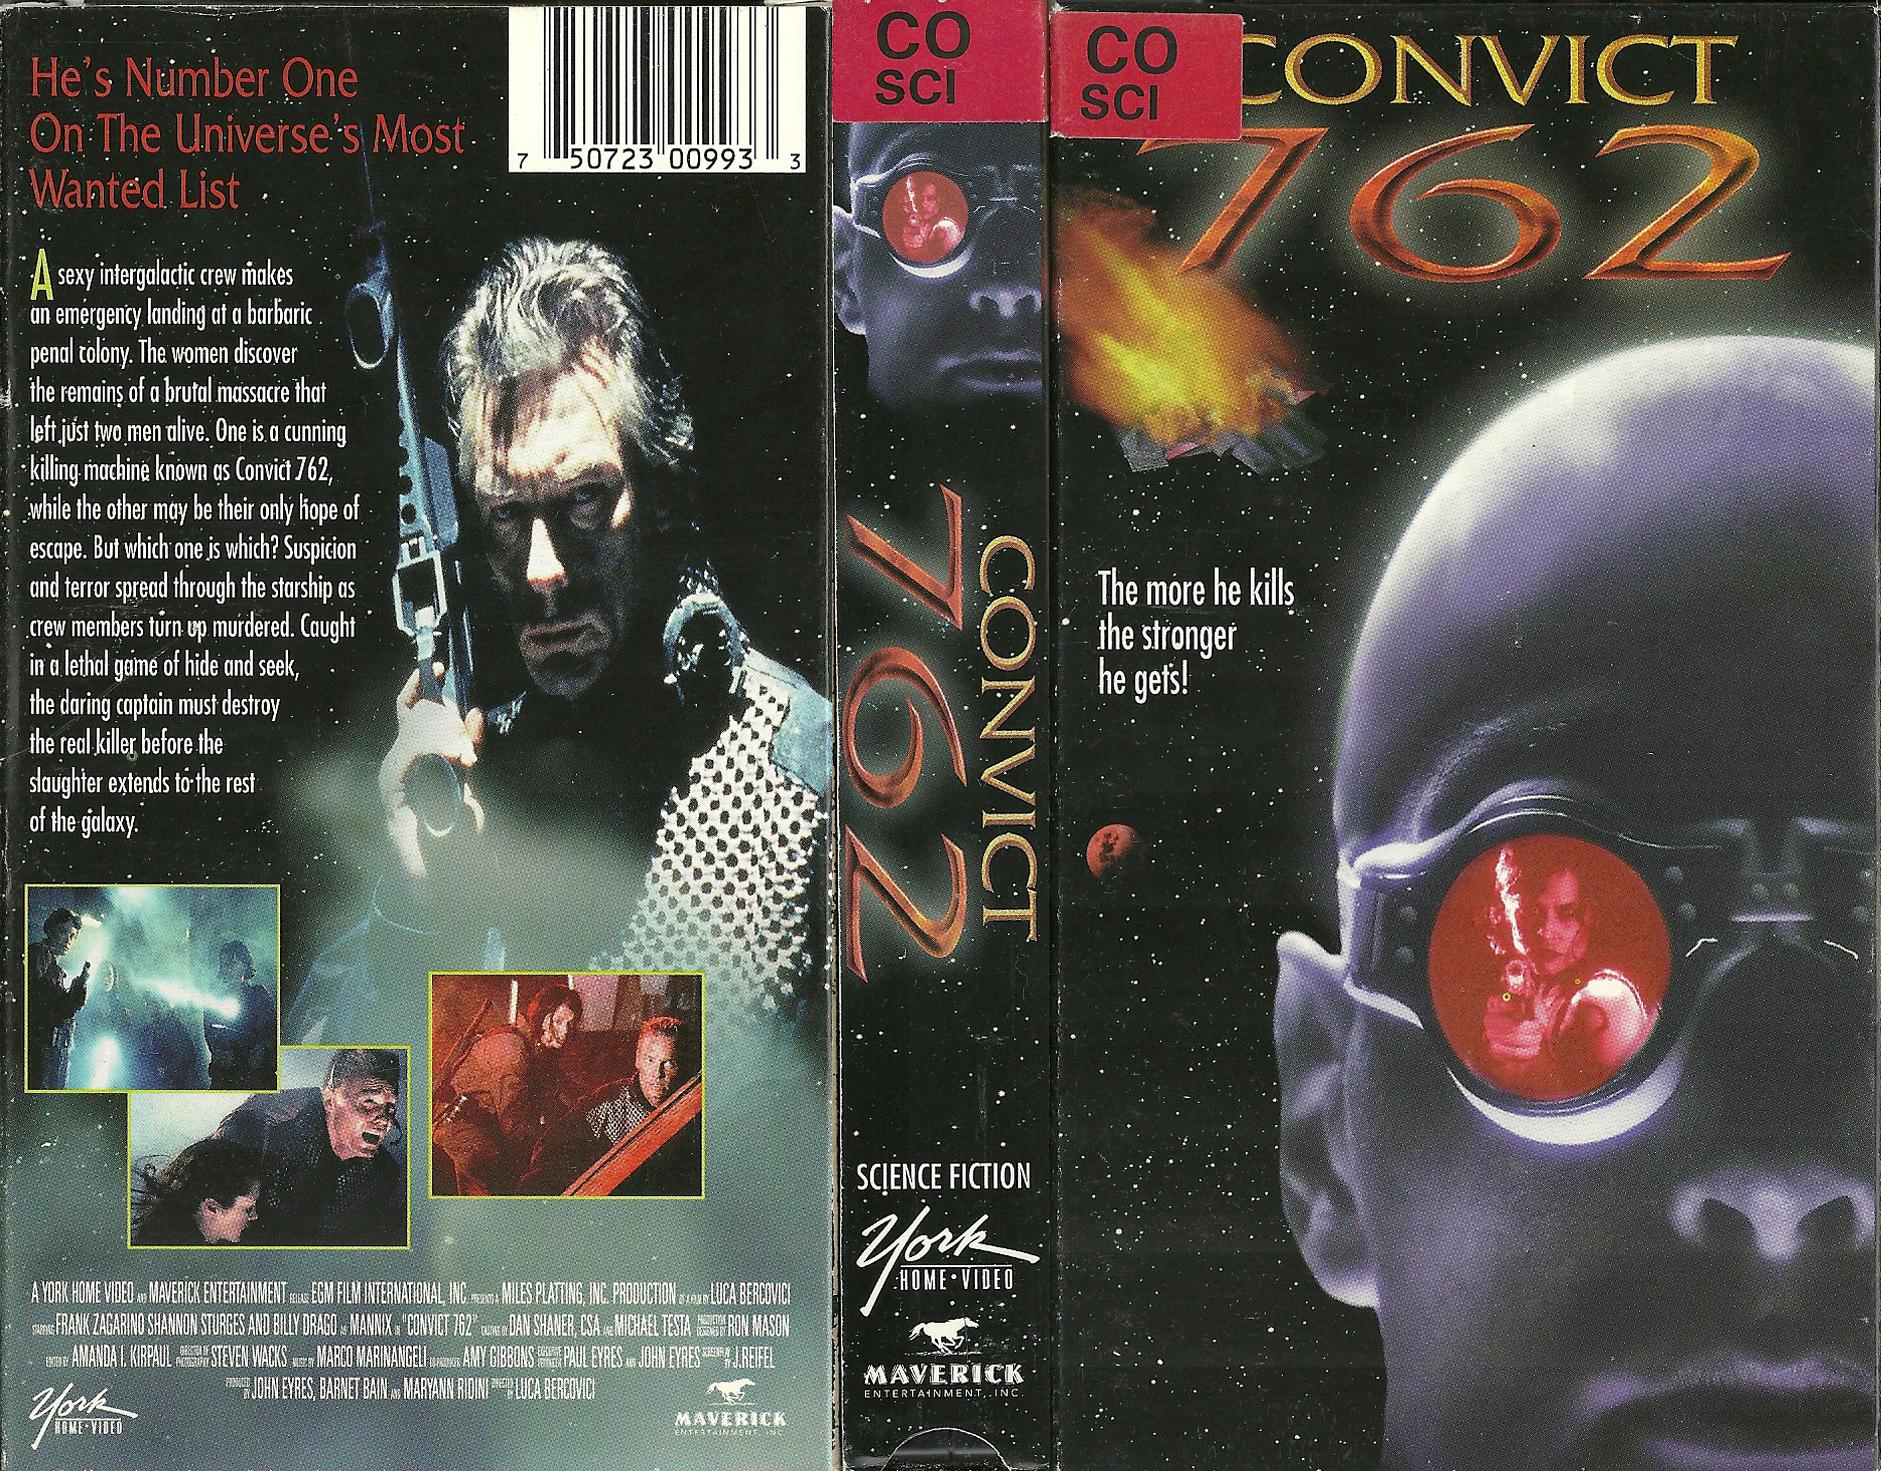 Convict 762 movie